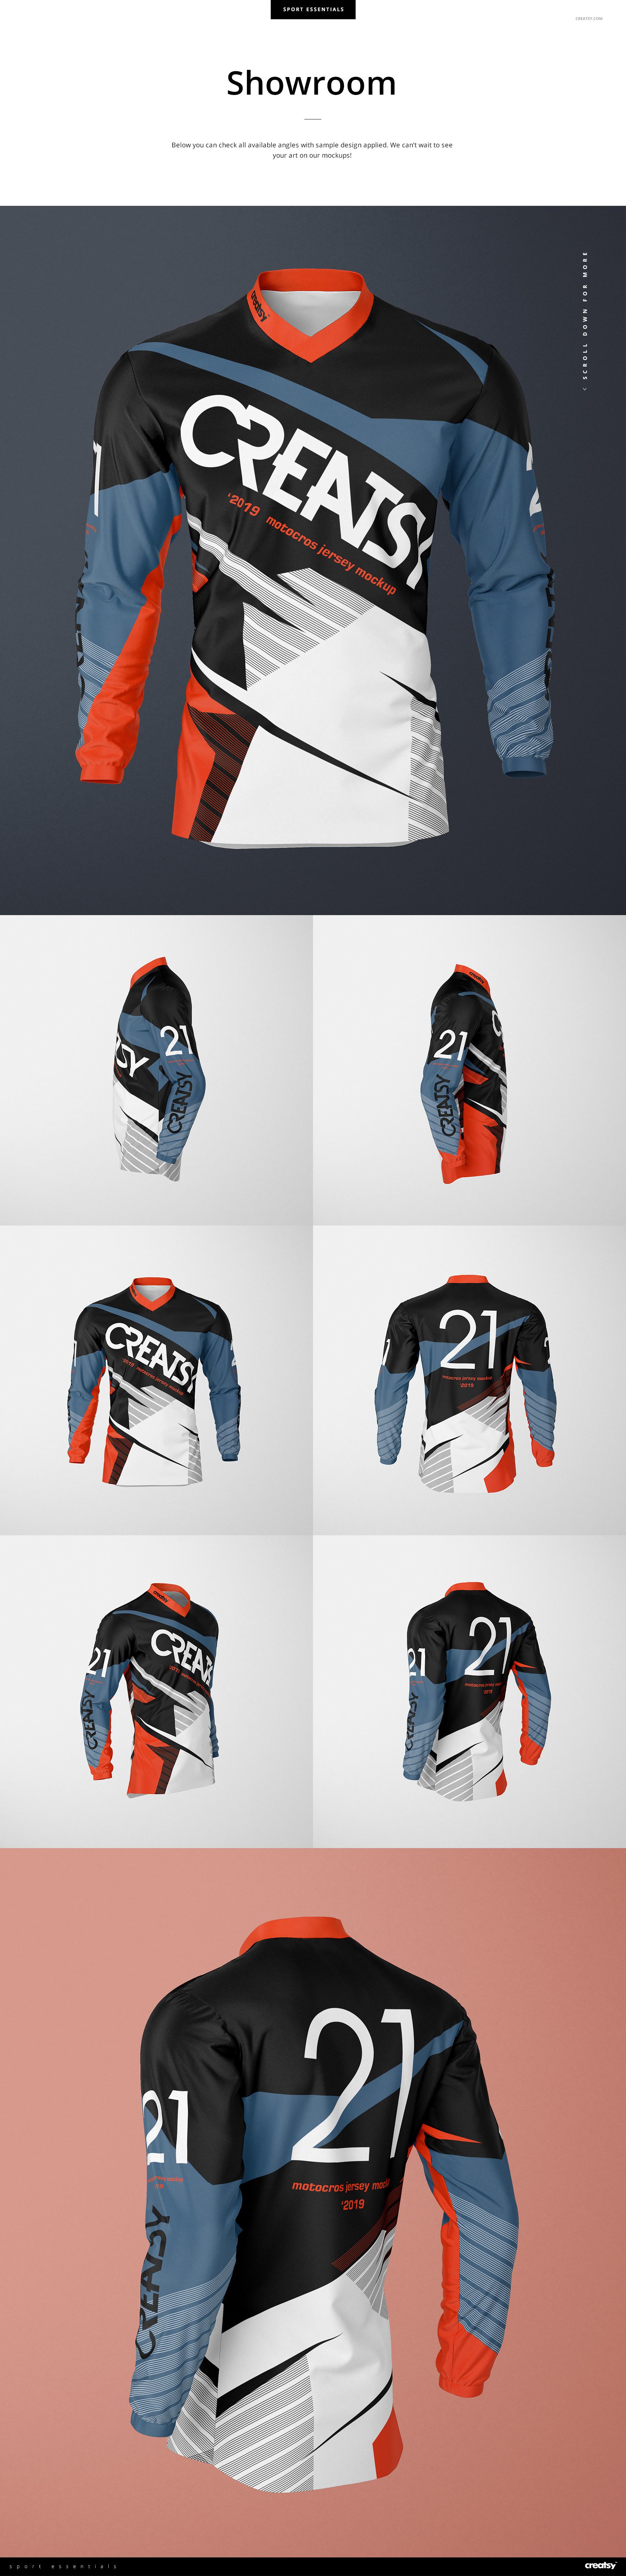 Motocross Jersey Mockup Set On Behance